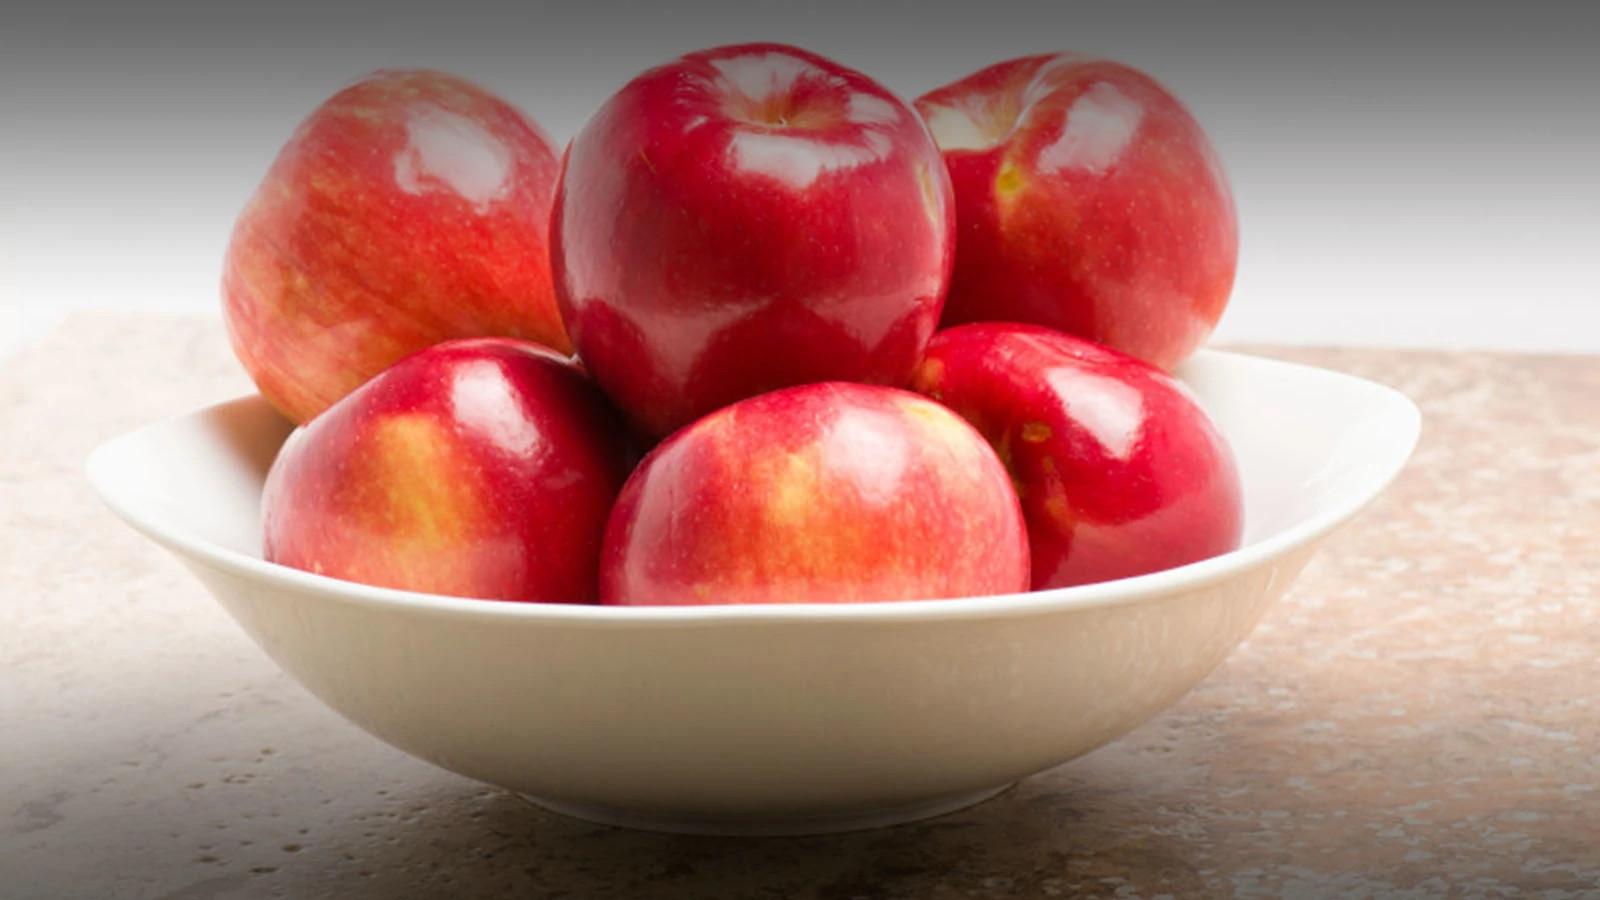 Rave Apples